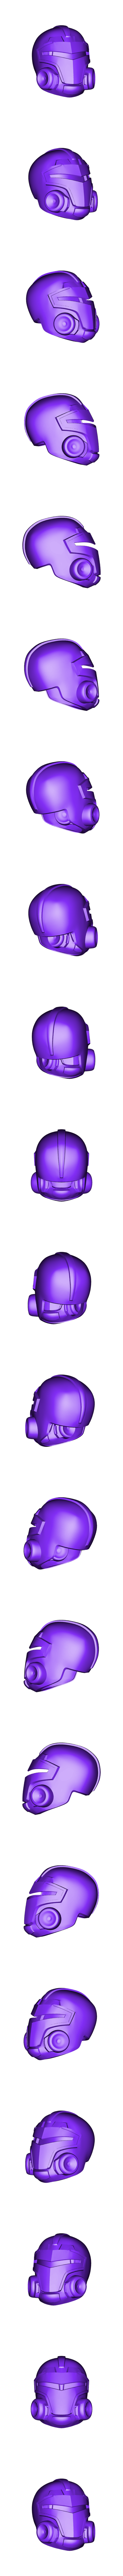 Blood_Dragon_Helmet_v3.stl Download free STL file Blood Dragon Helmet Mass Effect 2 • Design to 3D print, VillainousPropShop